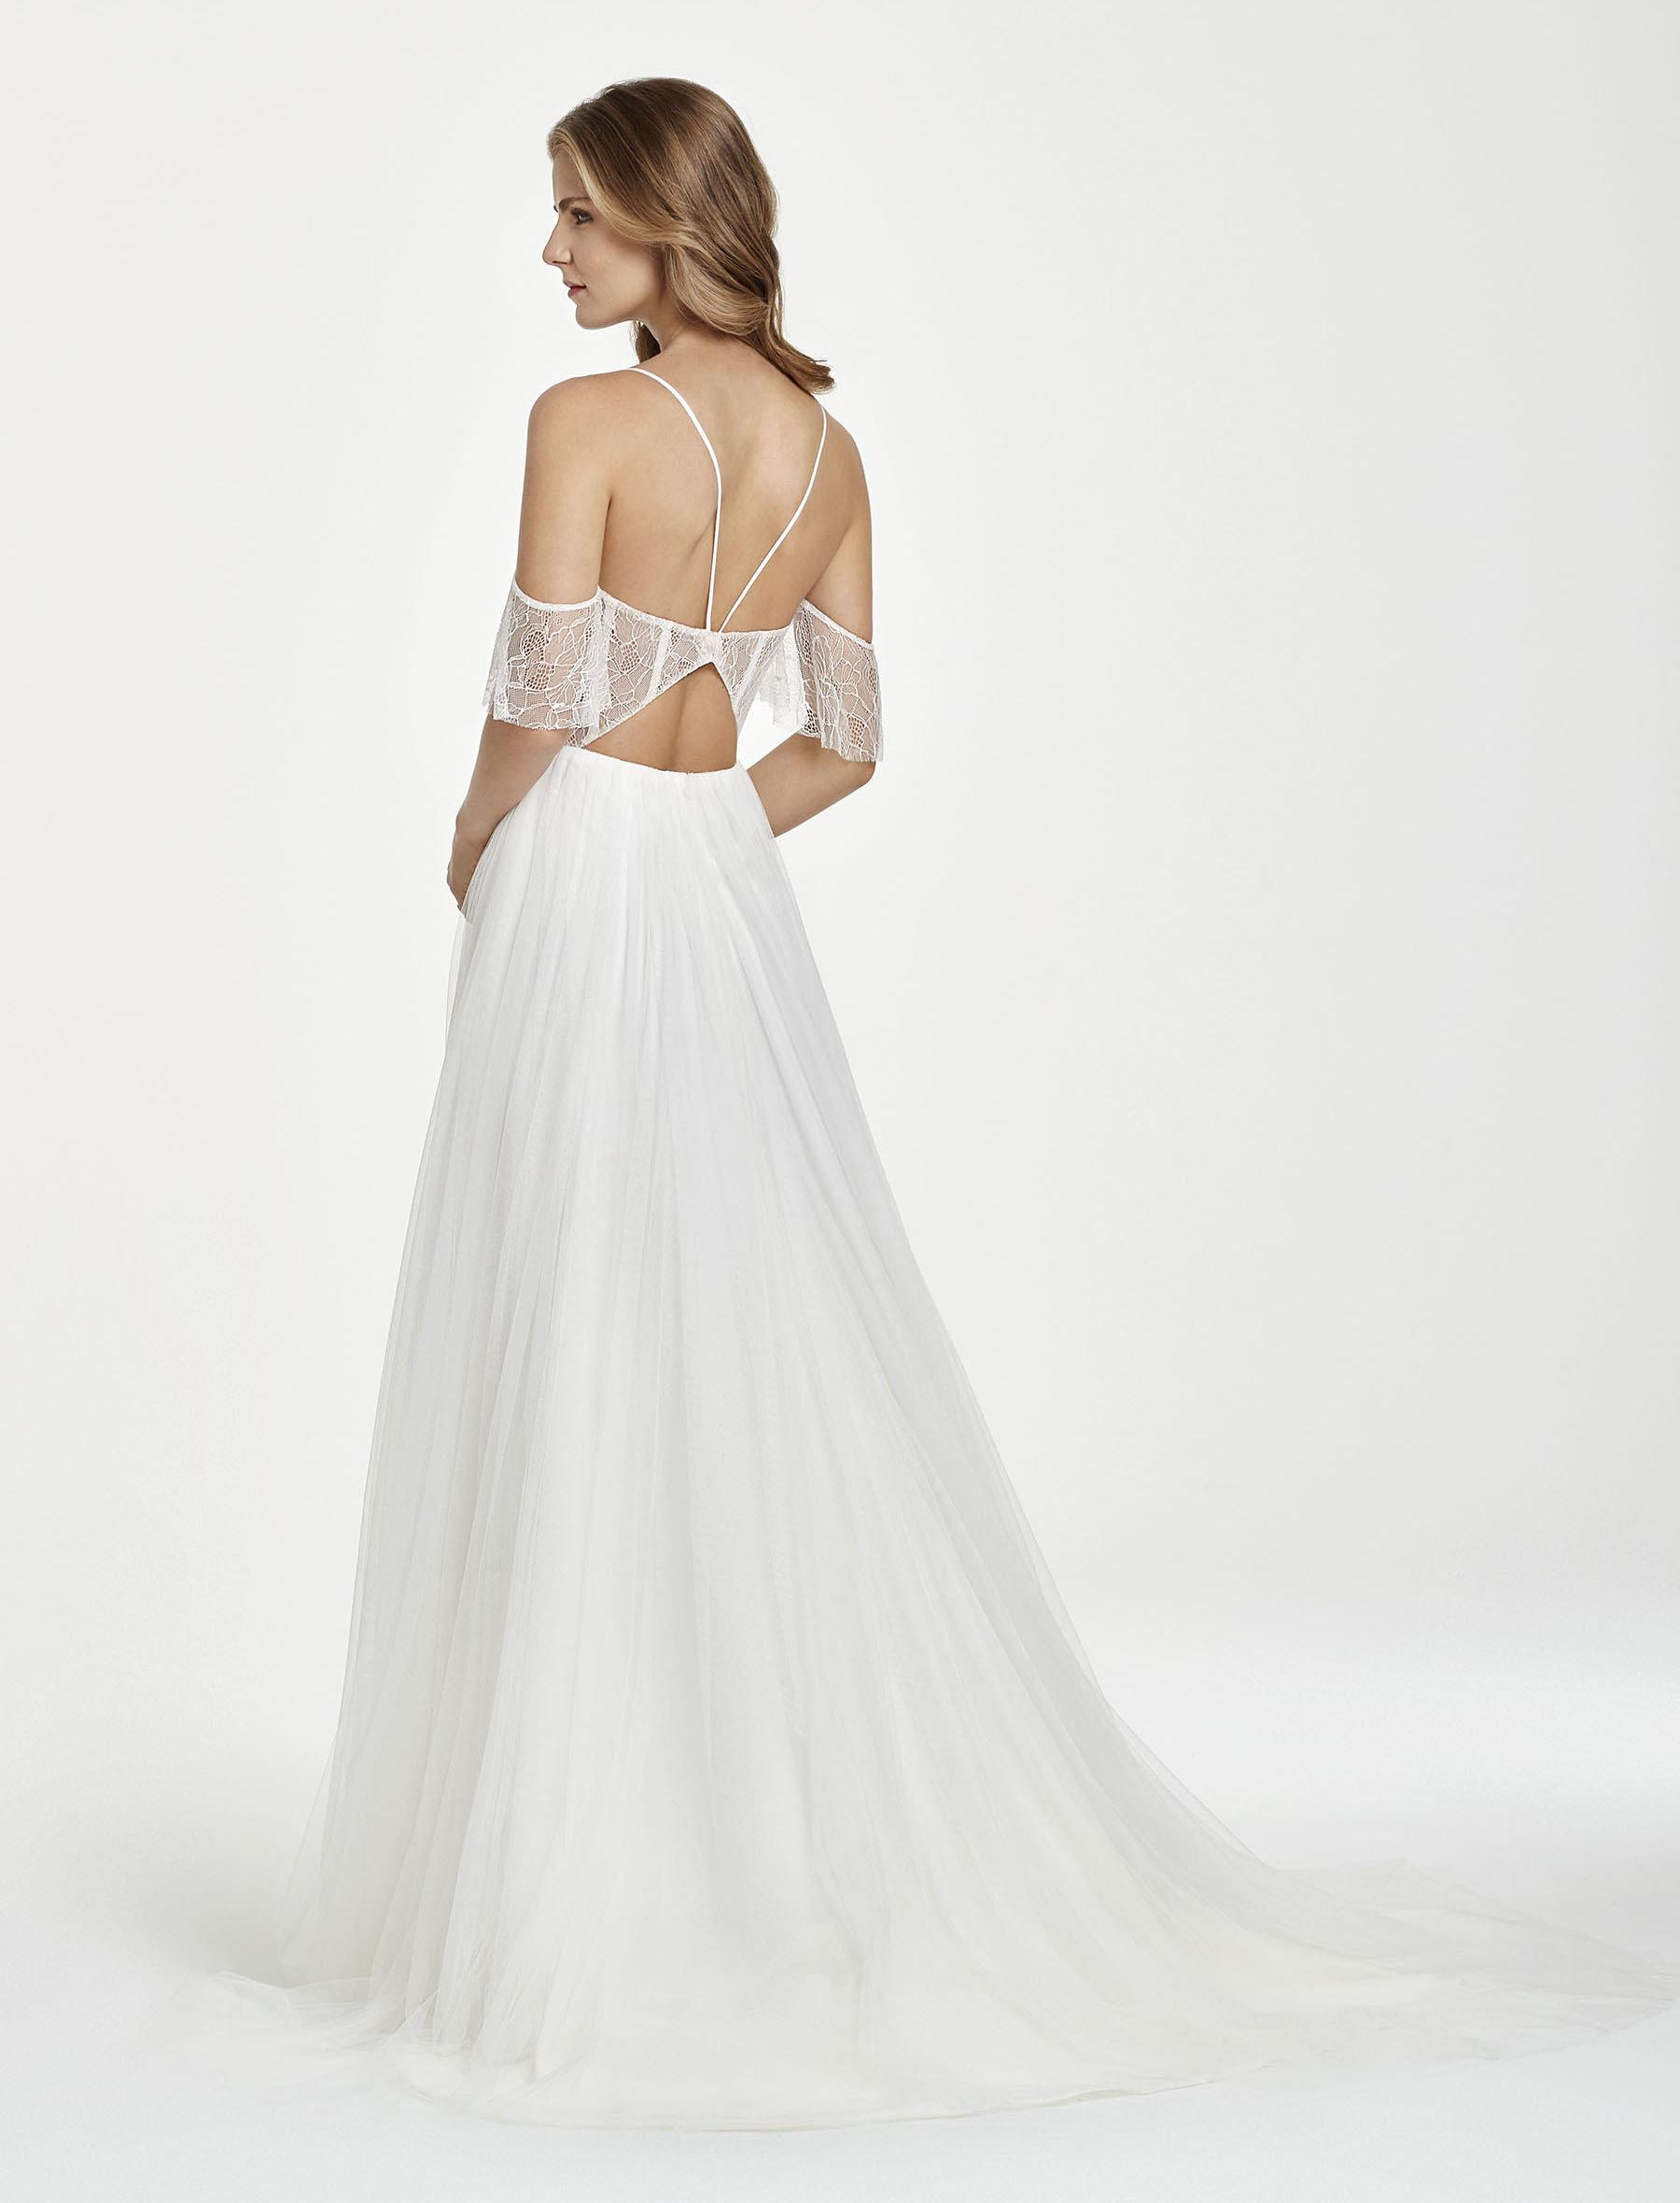 ivory-and-beau-bridal-boutique-zodiac-wedding-style-savannah-wedding-gowns-savannah-wedding-dresses-earnest-loans-12.jpg